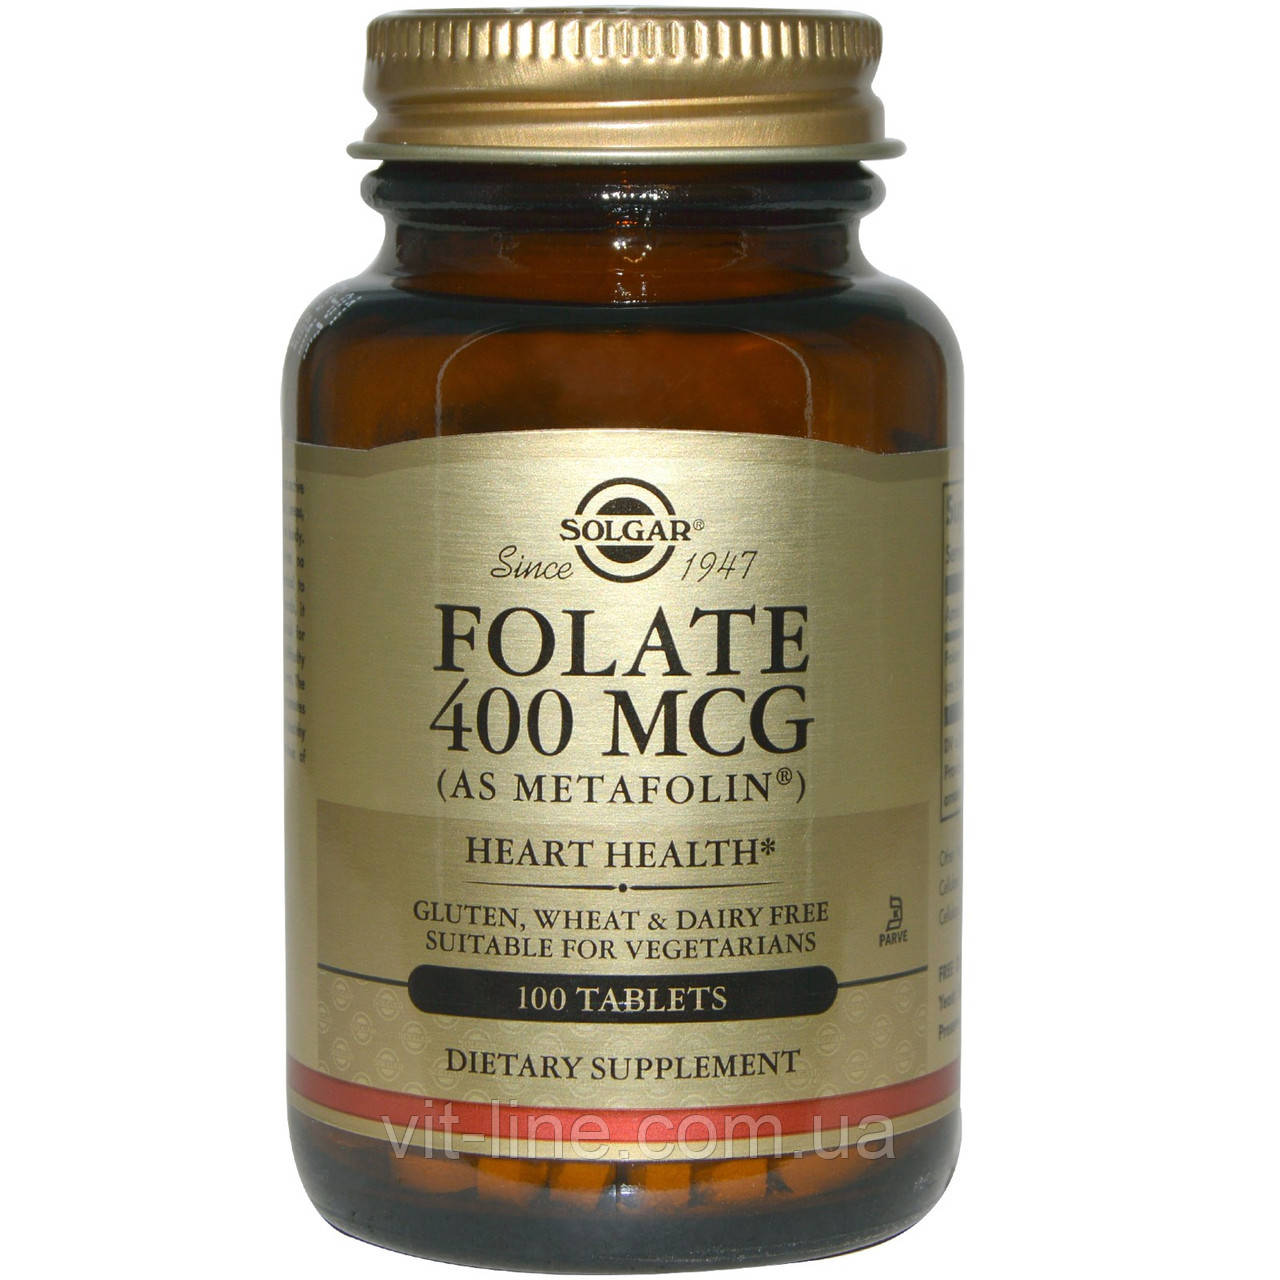 Solgar, Folate (As Metafolin), Фолат как метафолин 400 мкг 100 таблеток